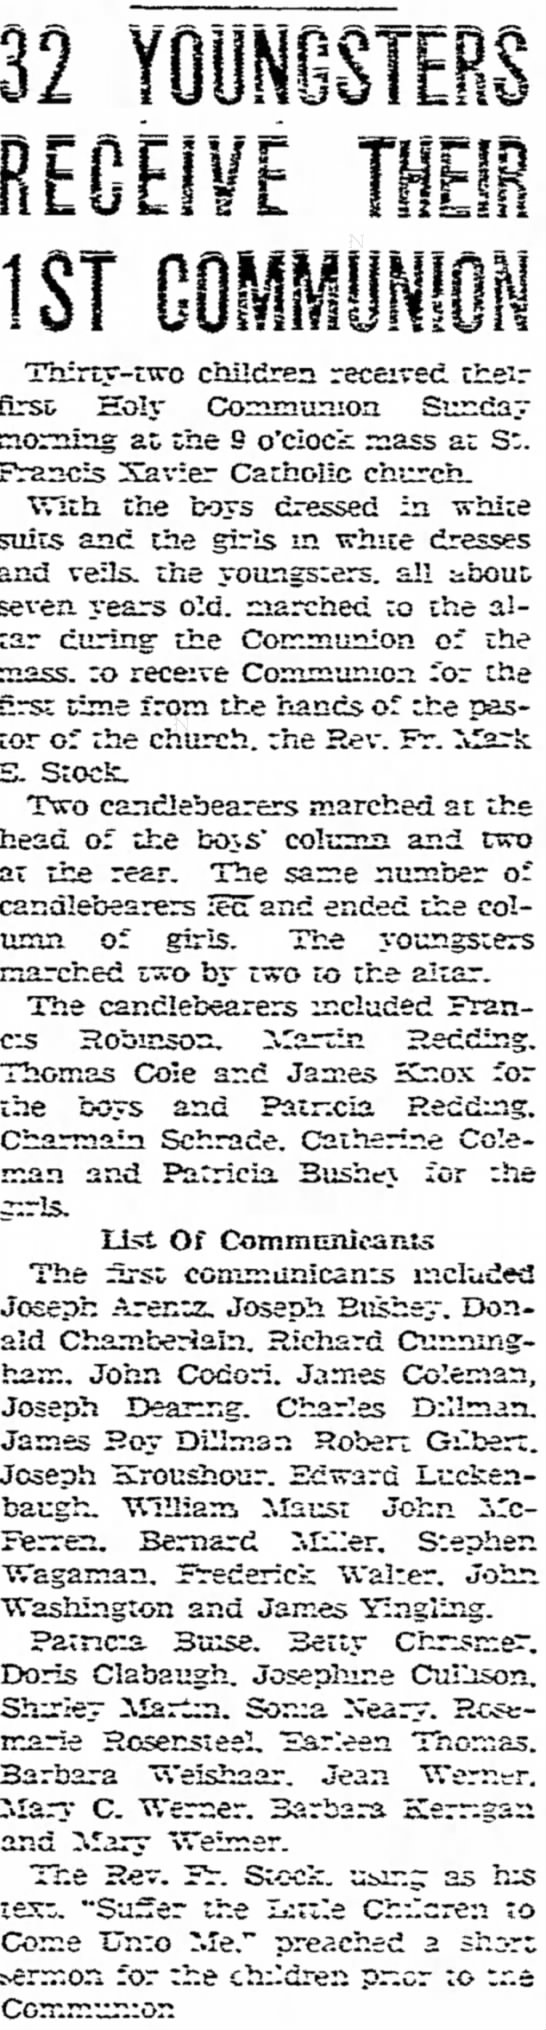 Earleen Thomas 1st communion - J was · on ; corn- of! Francis Xavier Catholic...